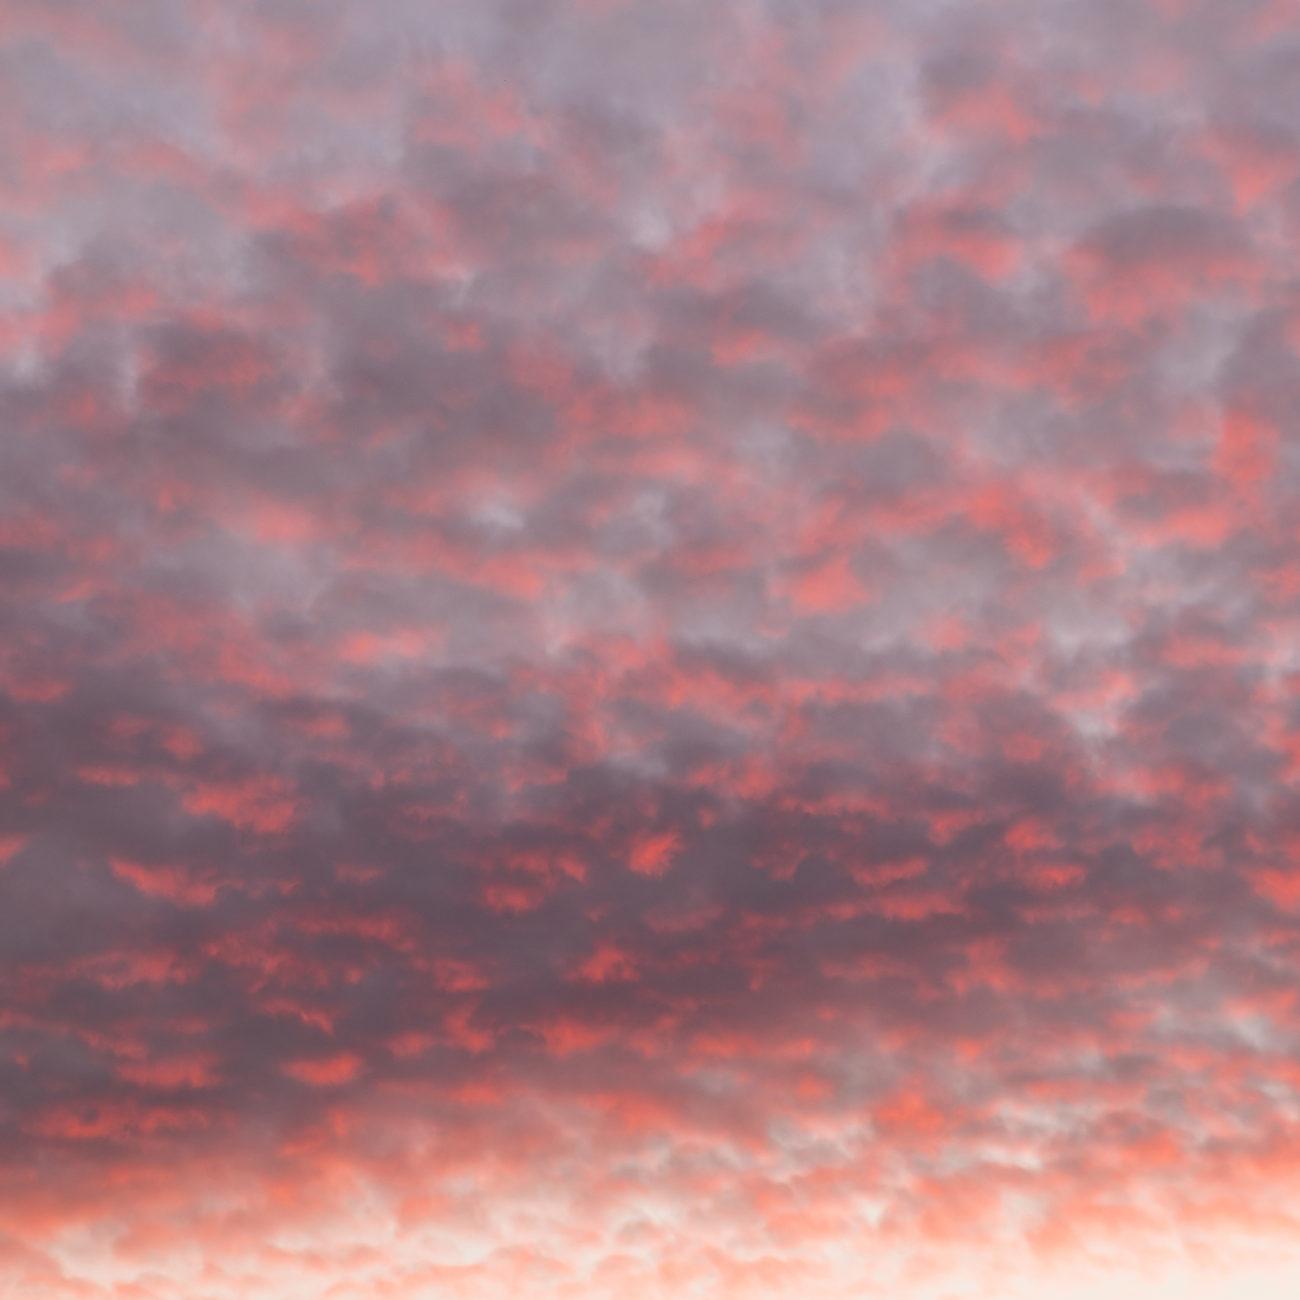 Buttermilk sunrise, 2015